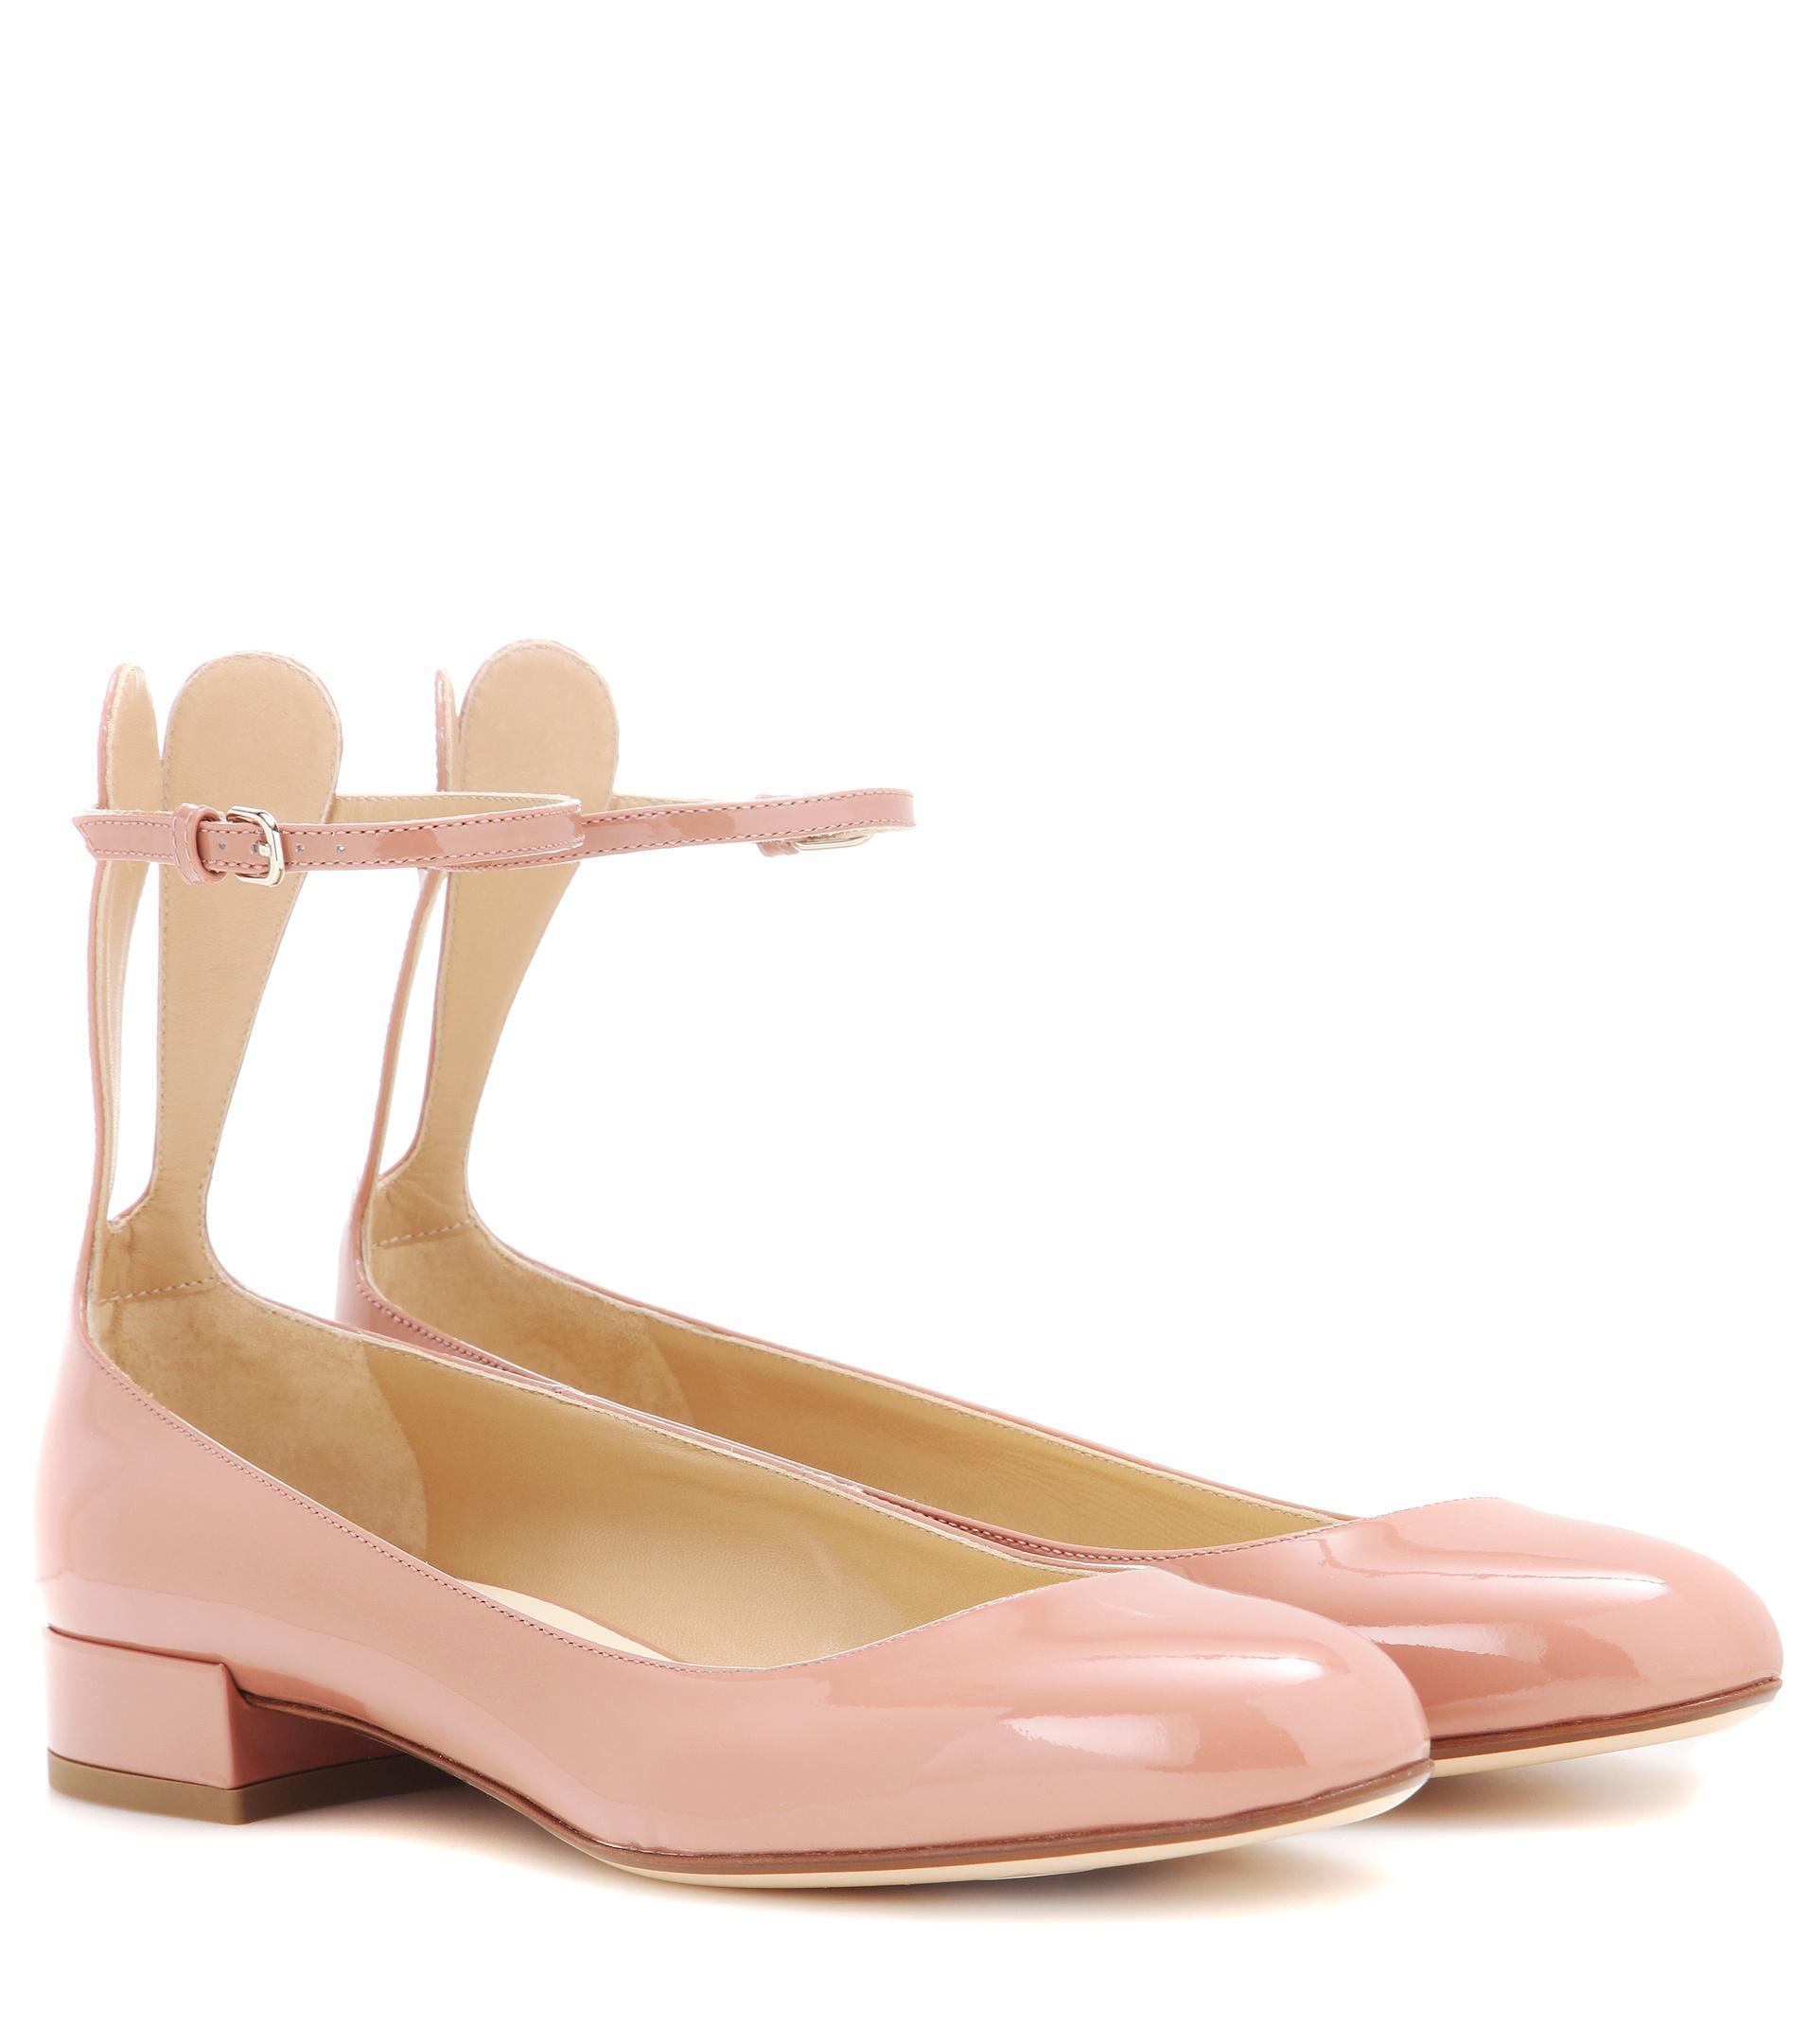 Francesco Russo Leather ballerinas BUrAuUnbA